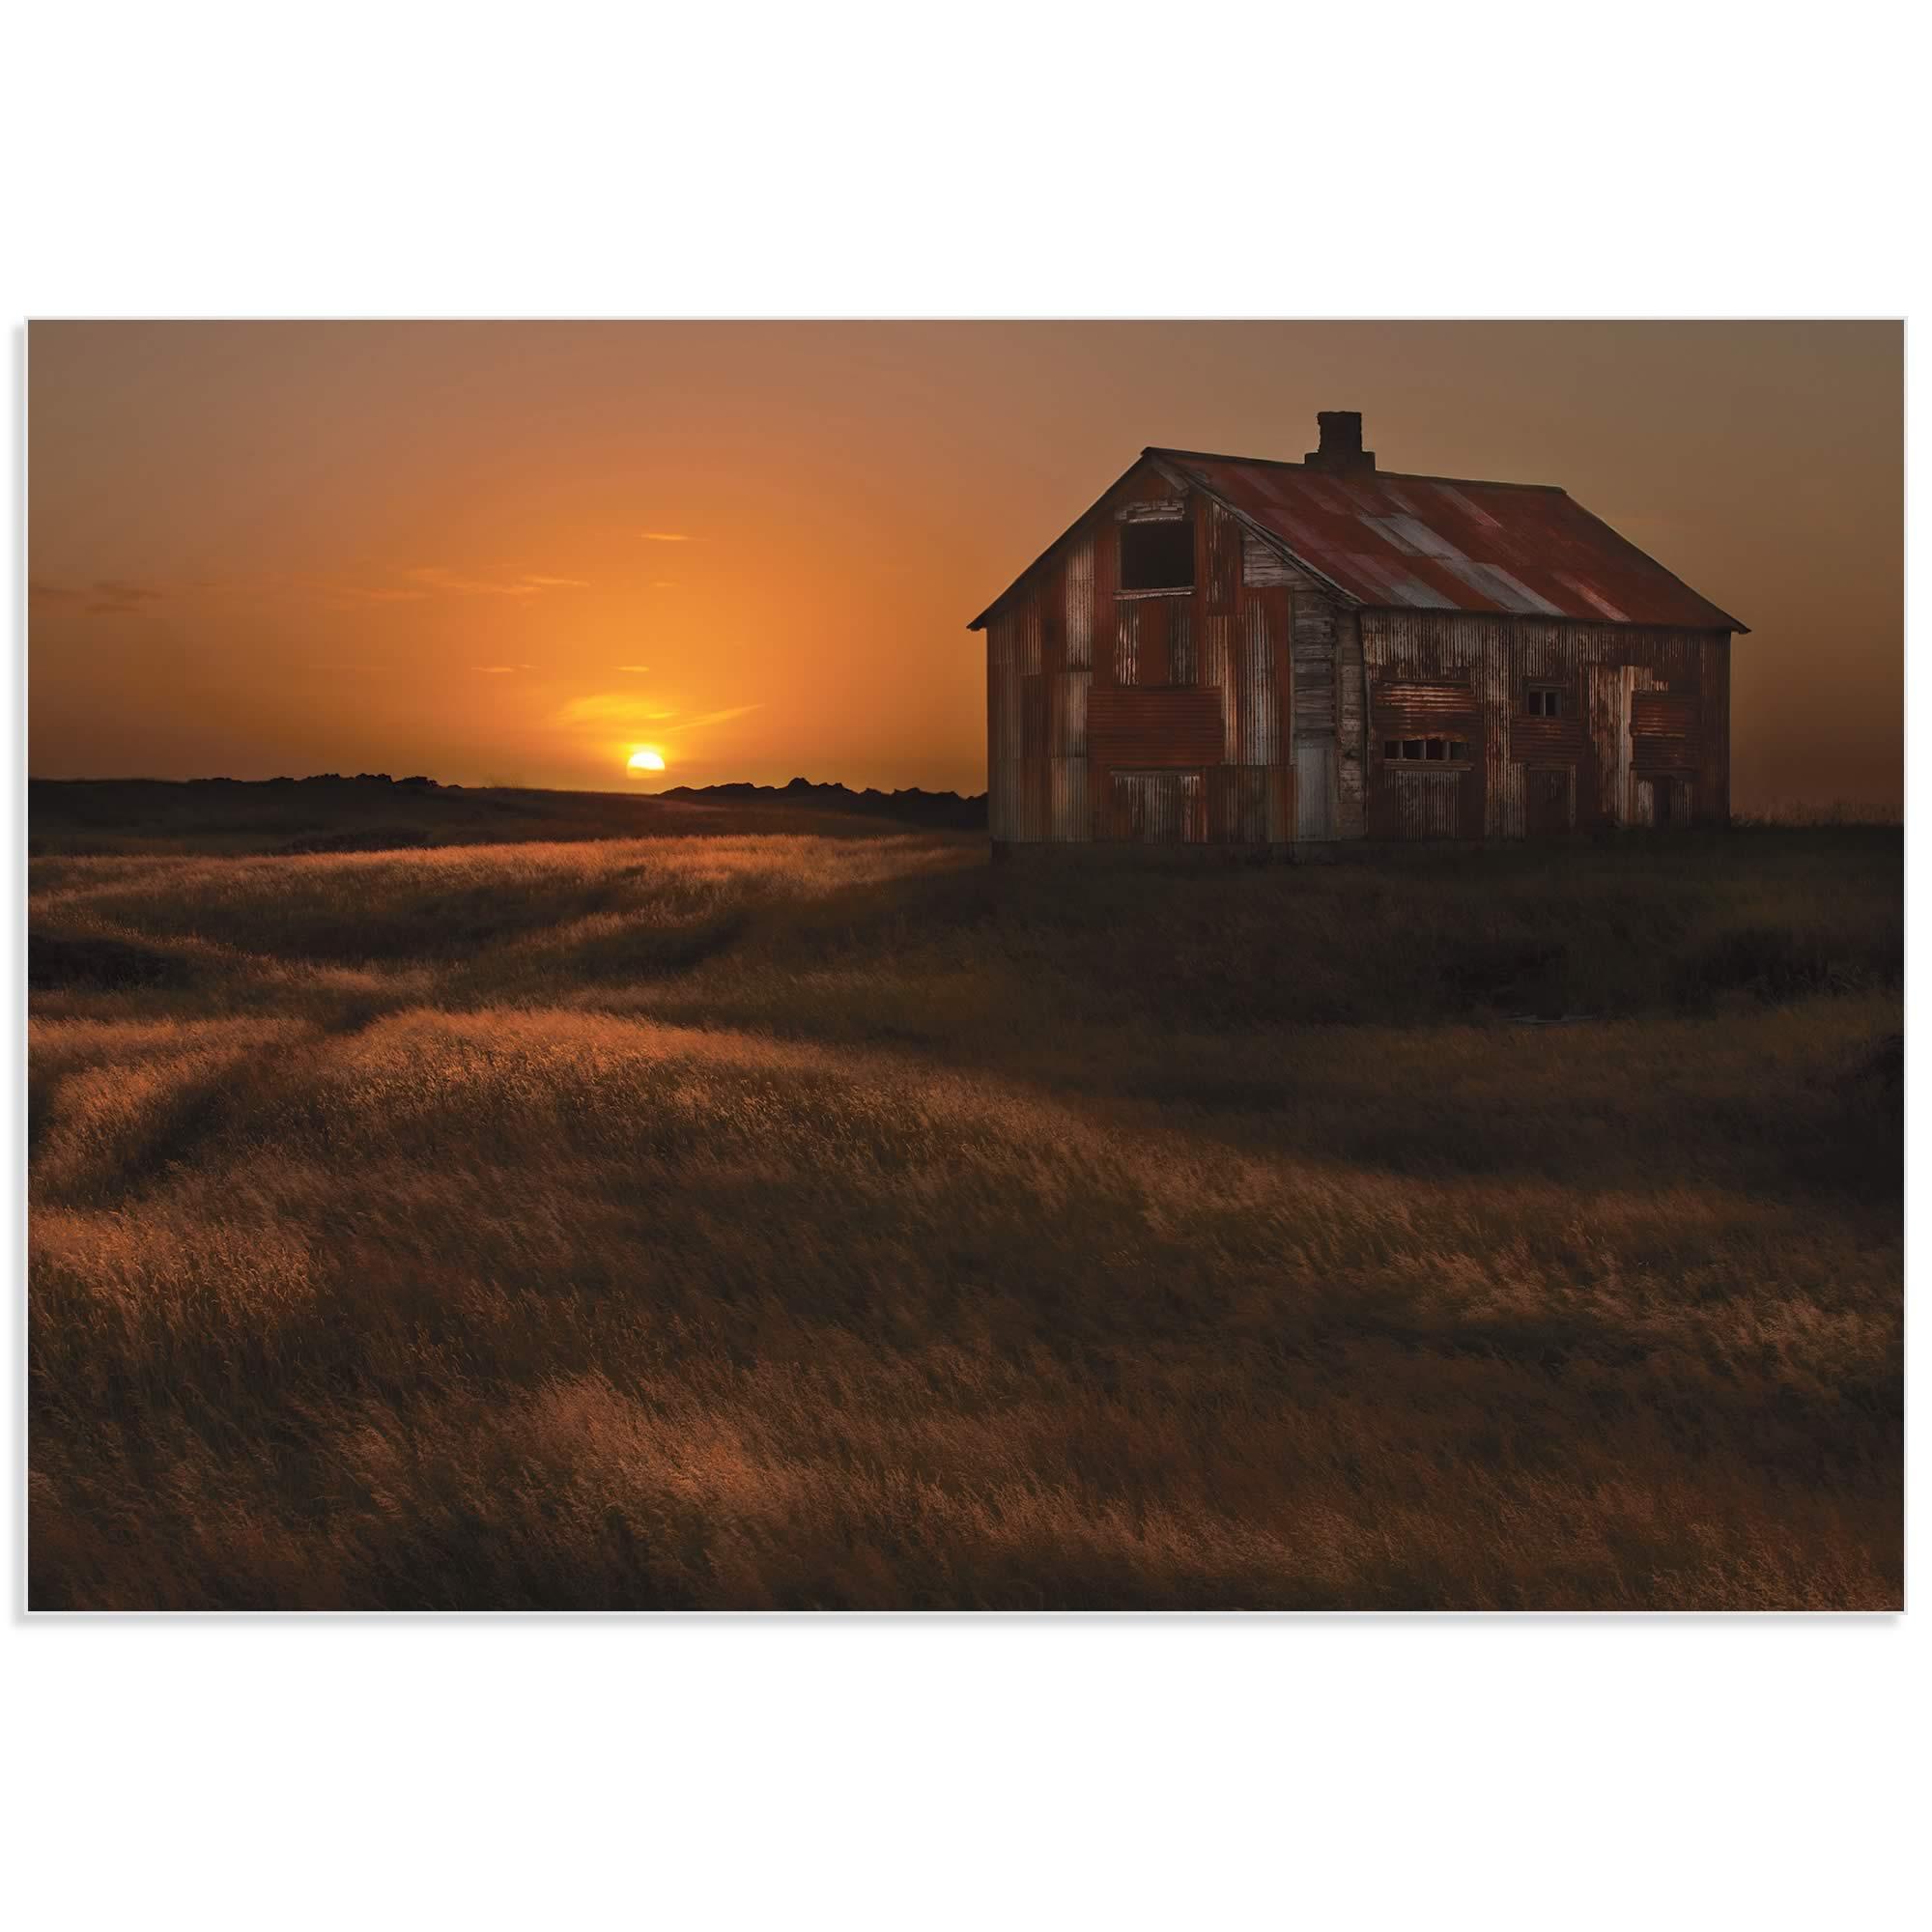 September Barn by Bragi Ingibergsson - Rustic Decor on Metal or Acrylic - Alternate View 2